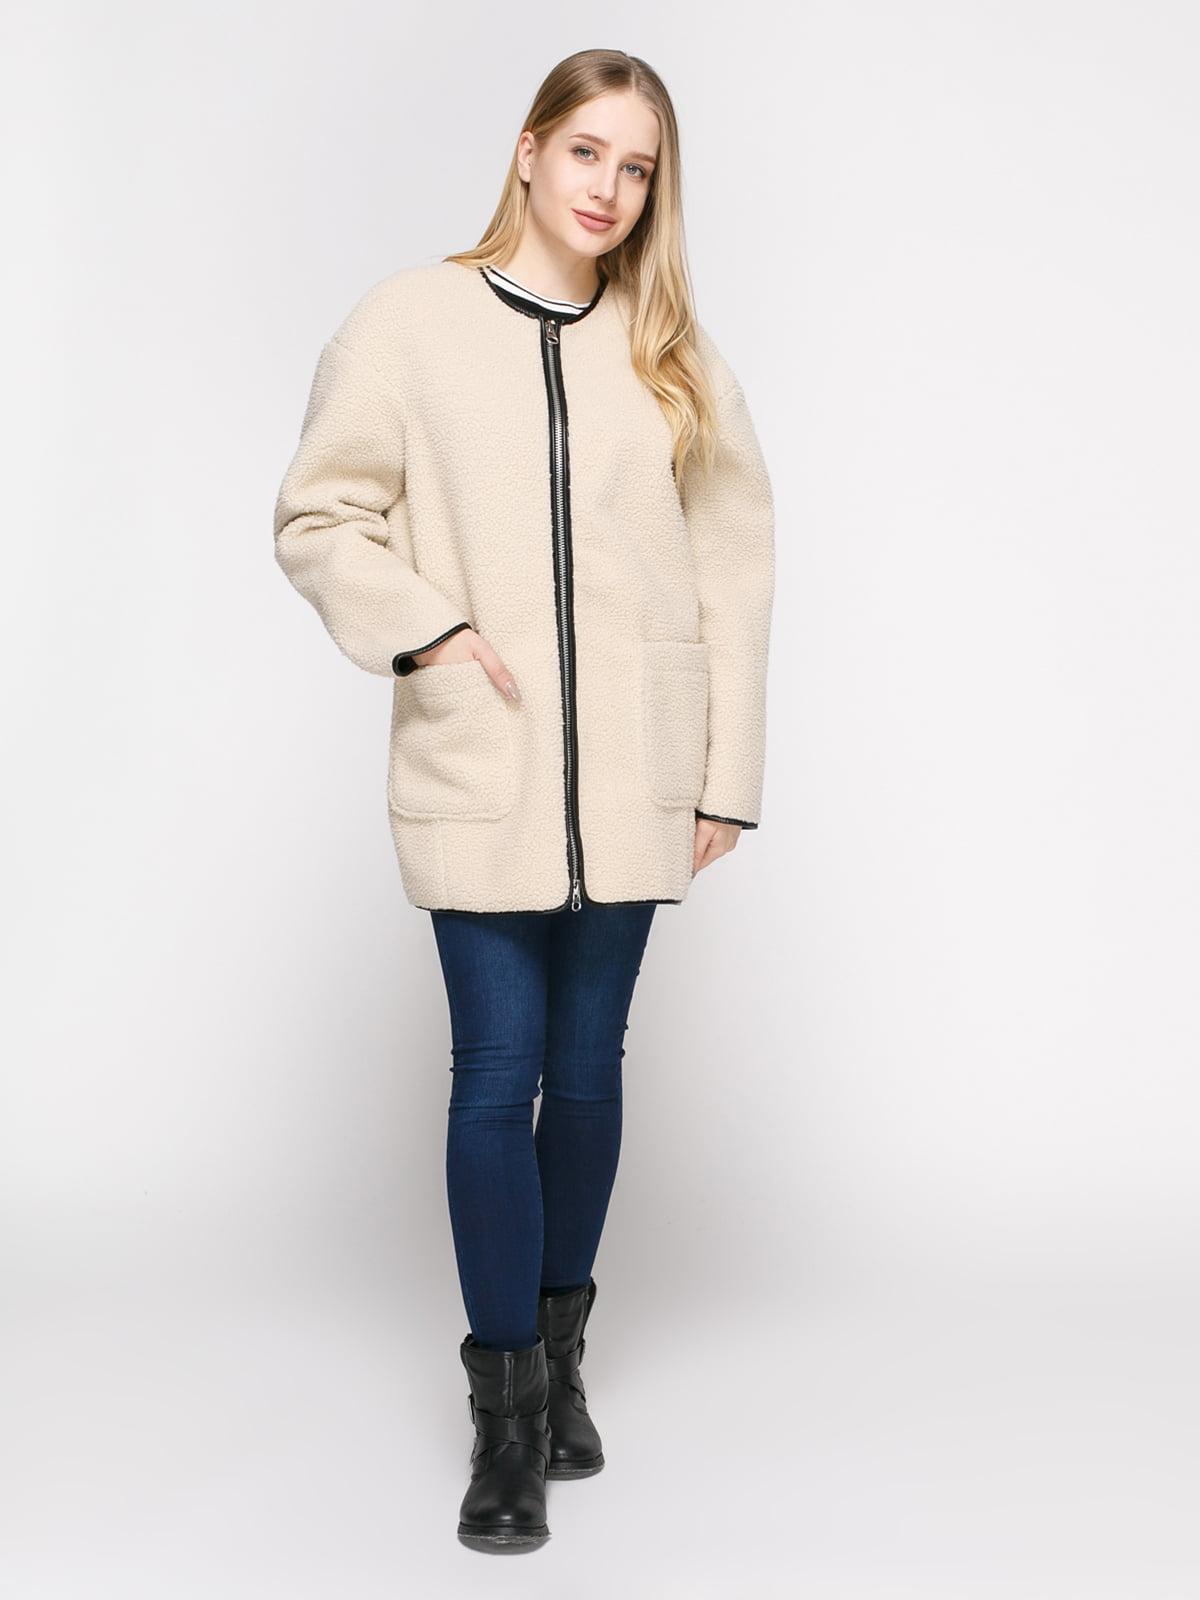 Пальто светло-бежевое | 4808022 | фото 2